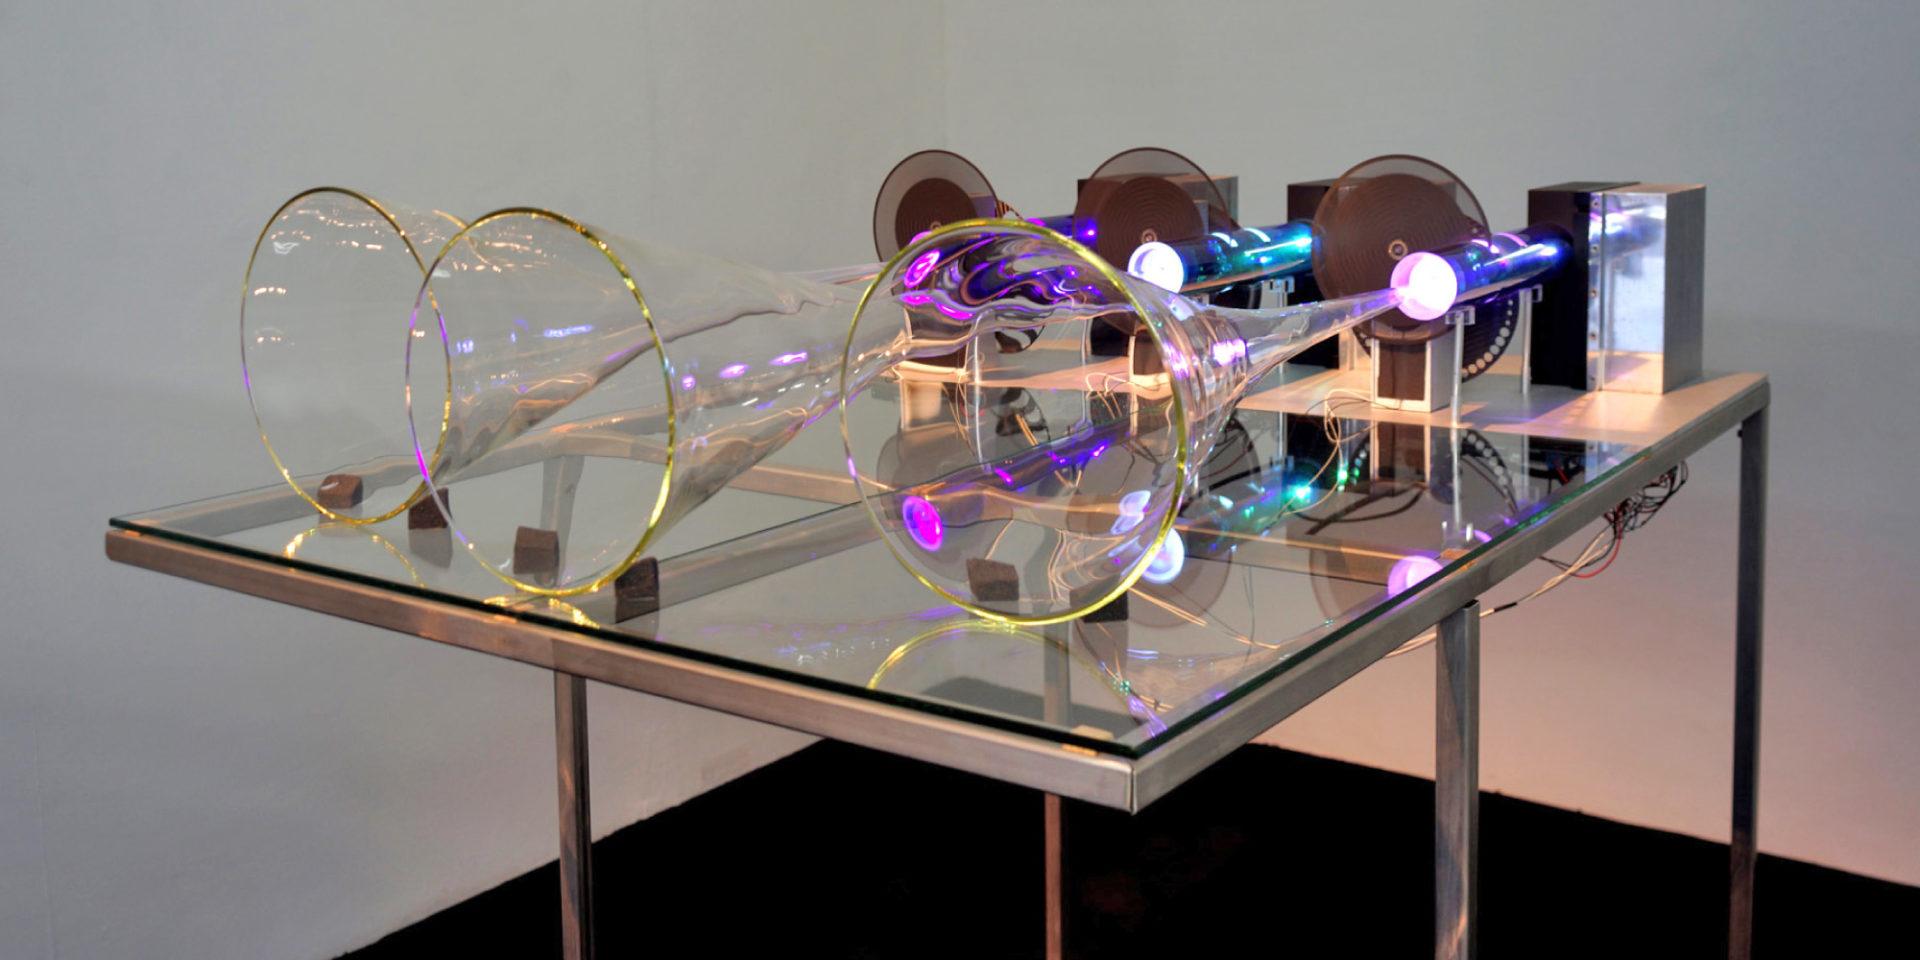 Glazen speakers - Jeroen Borrenbergs)